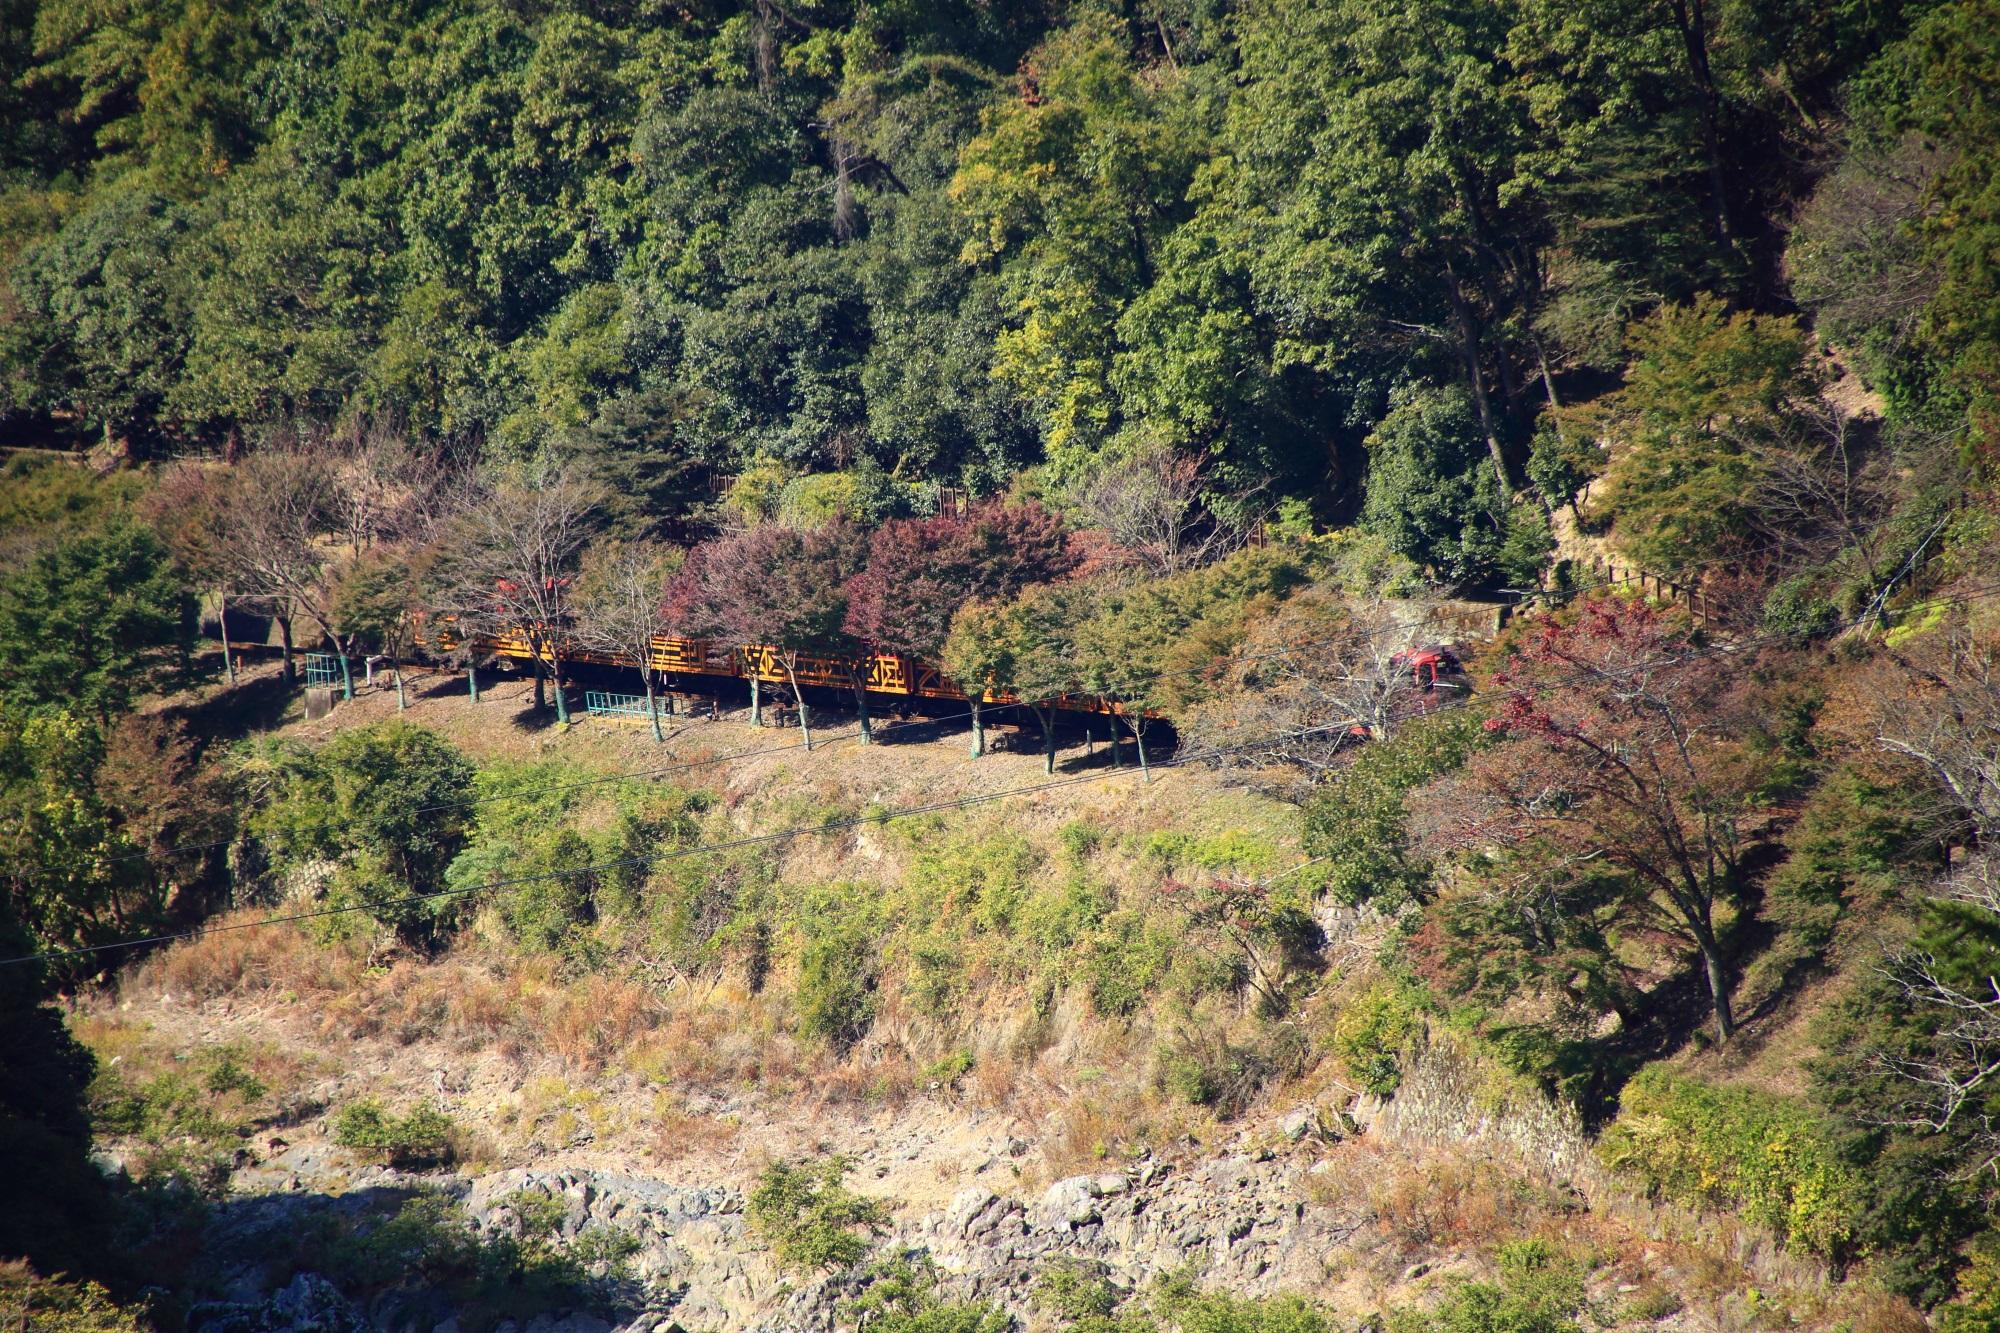 トロッコ列車 保津峡 嵐山公園 亀山地区